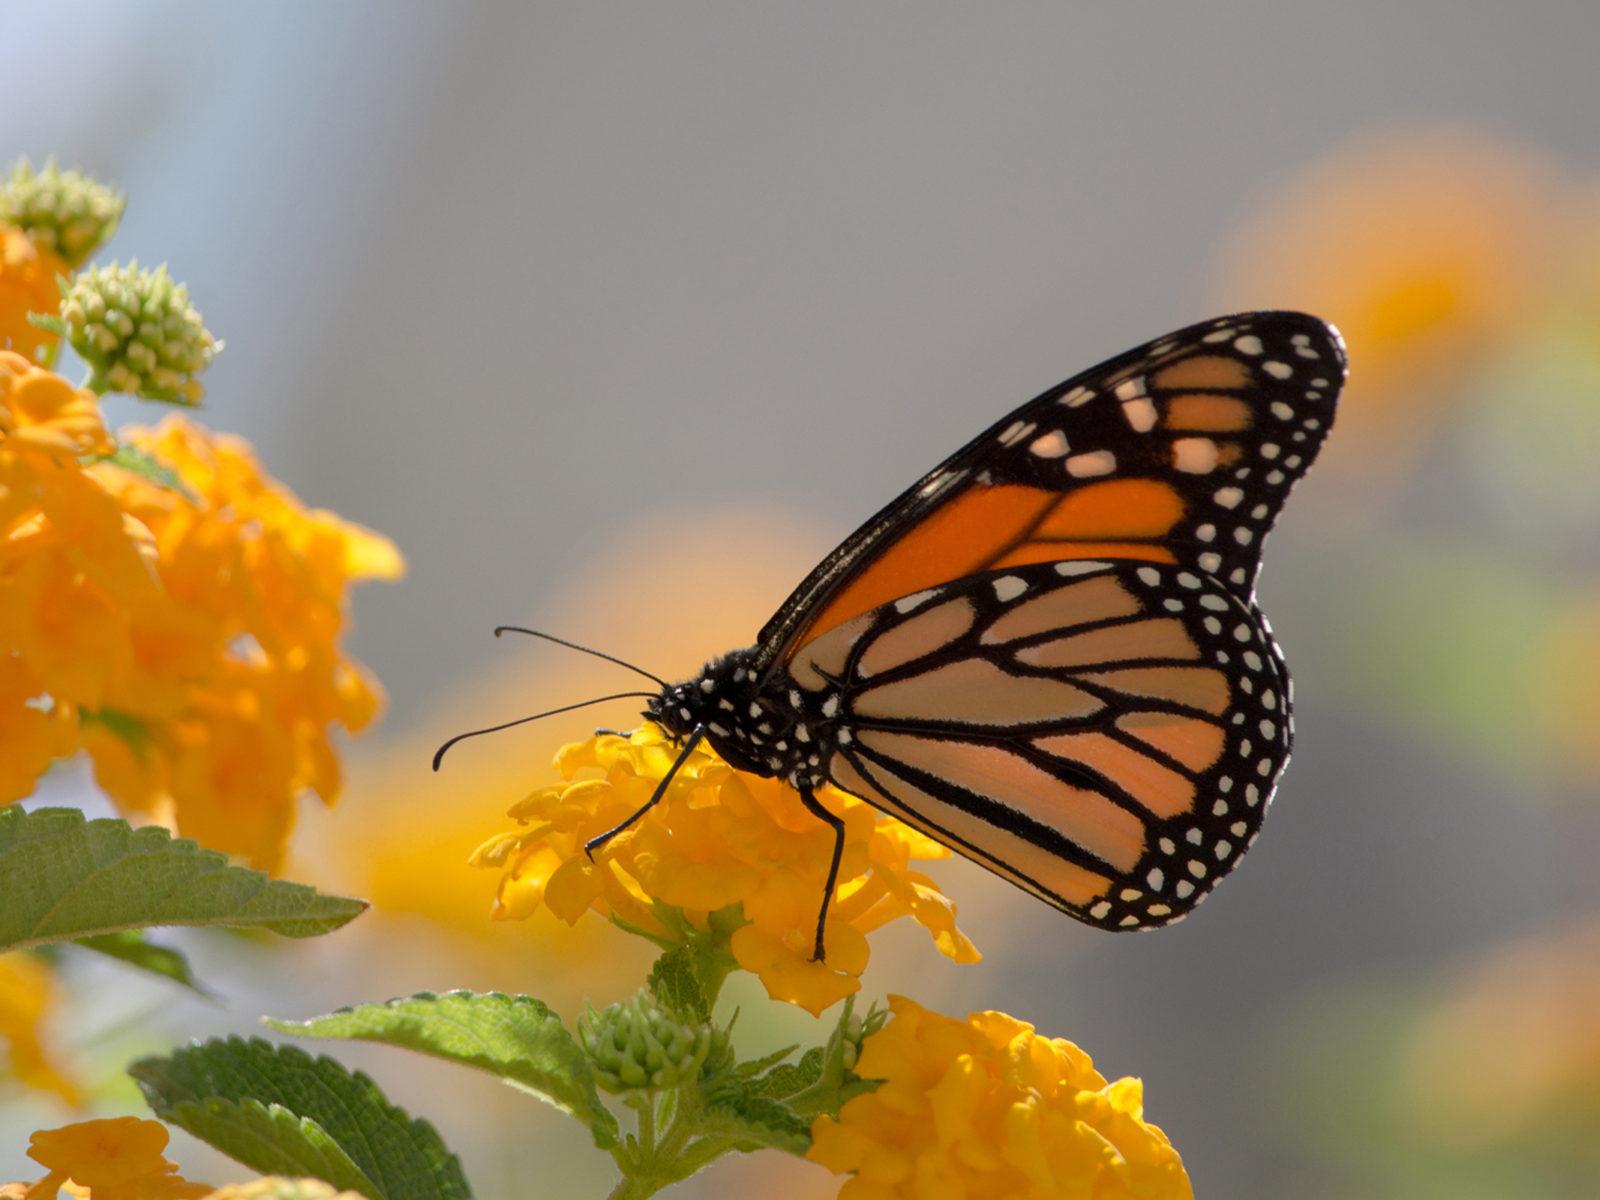 Desktop Wallpaper Animals Download Free Monarch Butterfly And Yellow Lanthana Desktop Wallpaper